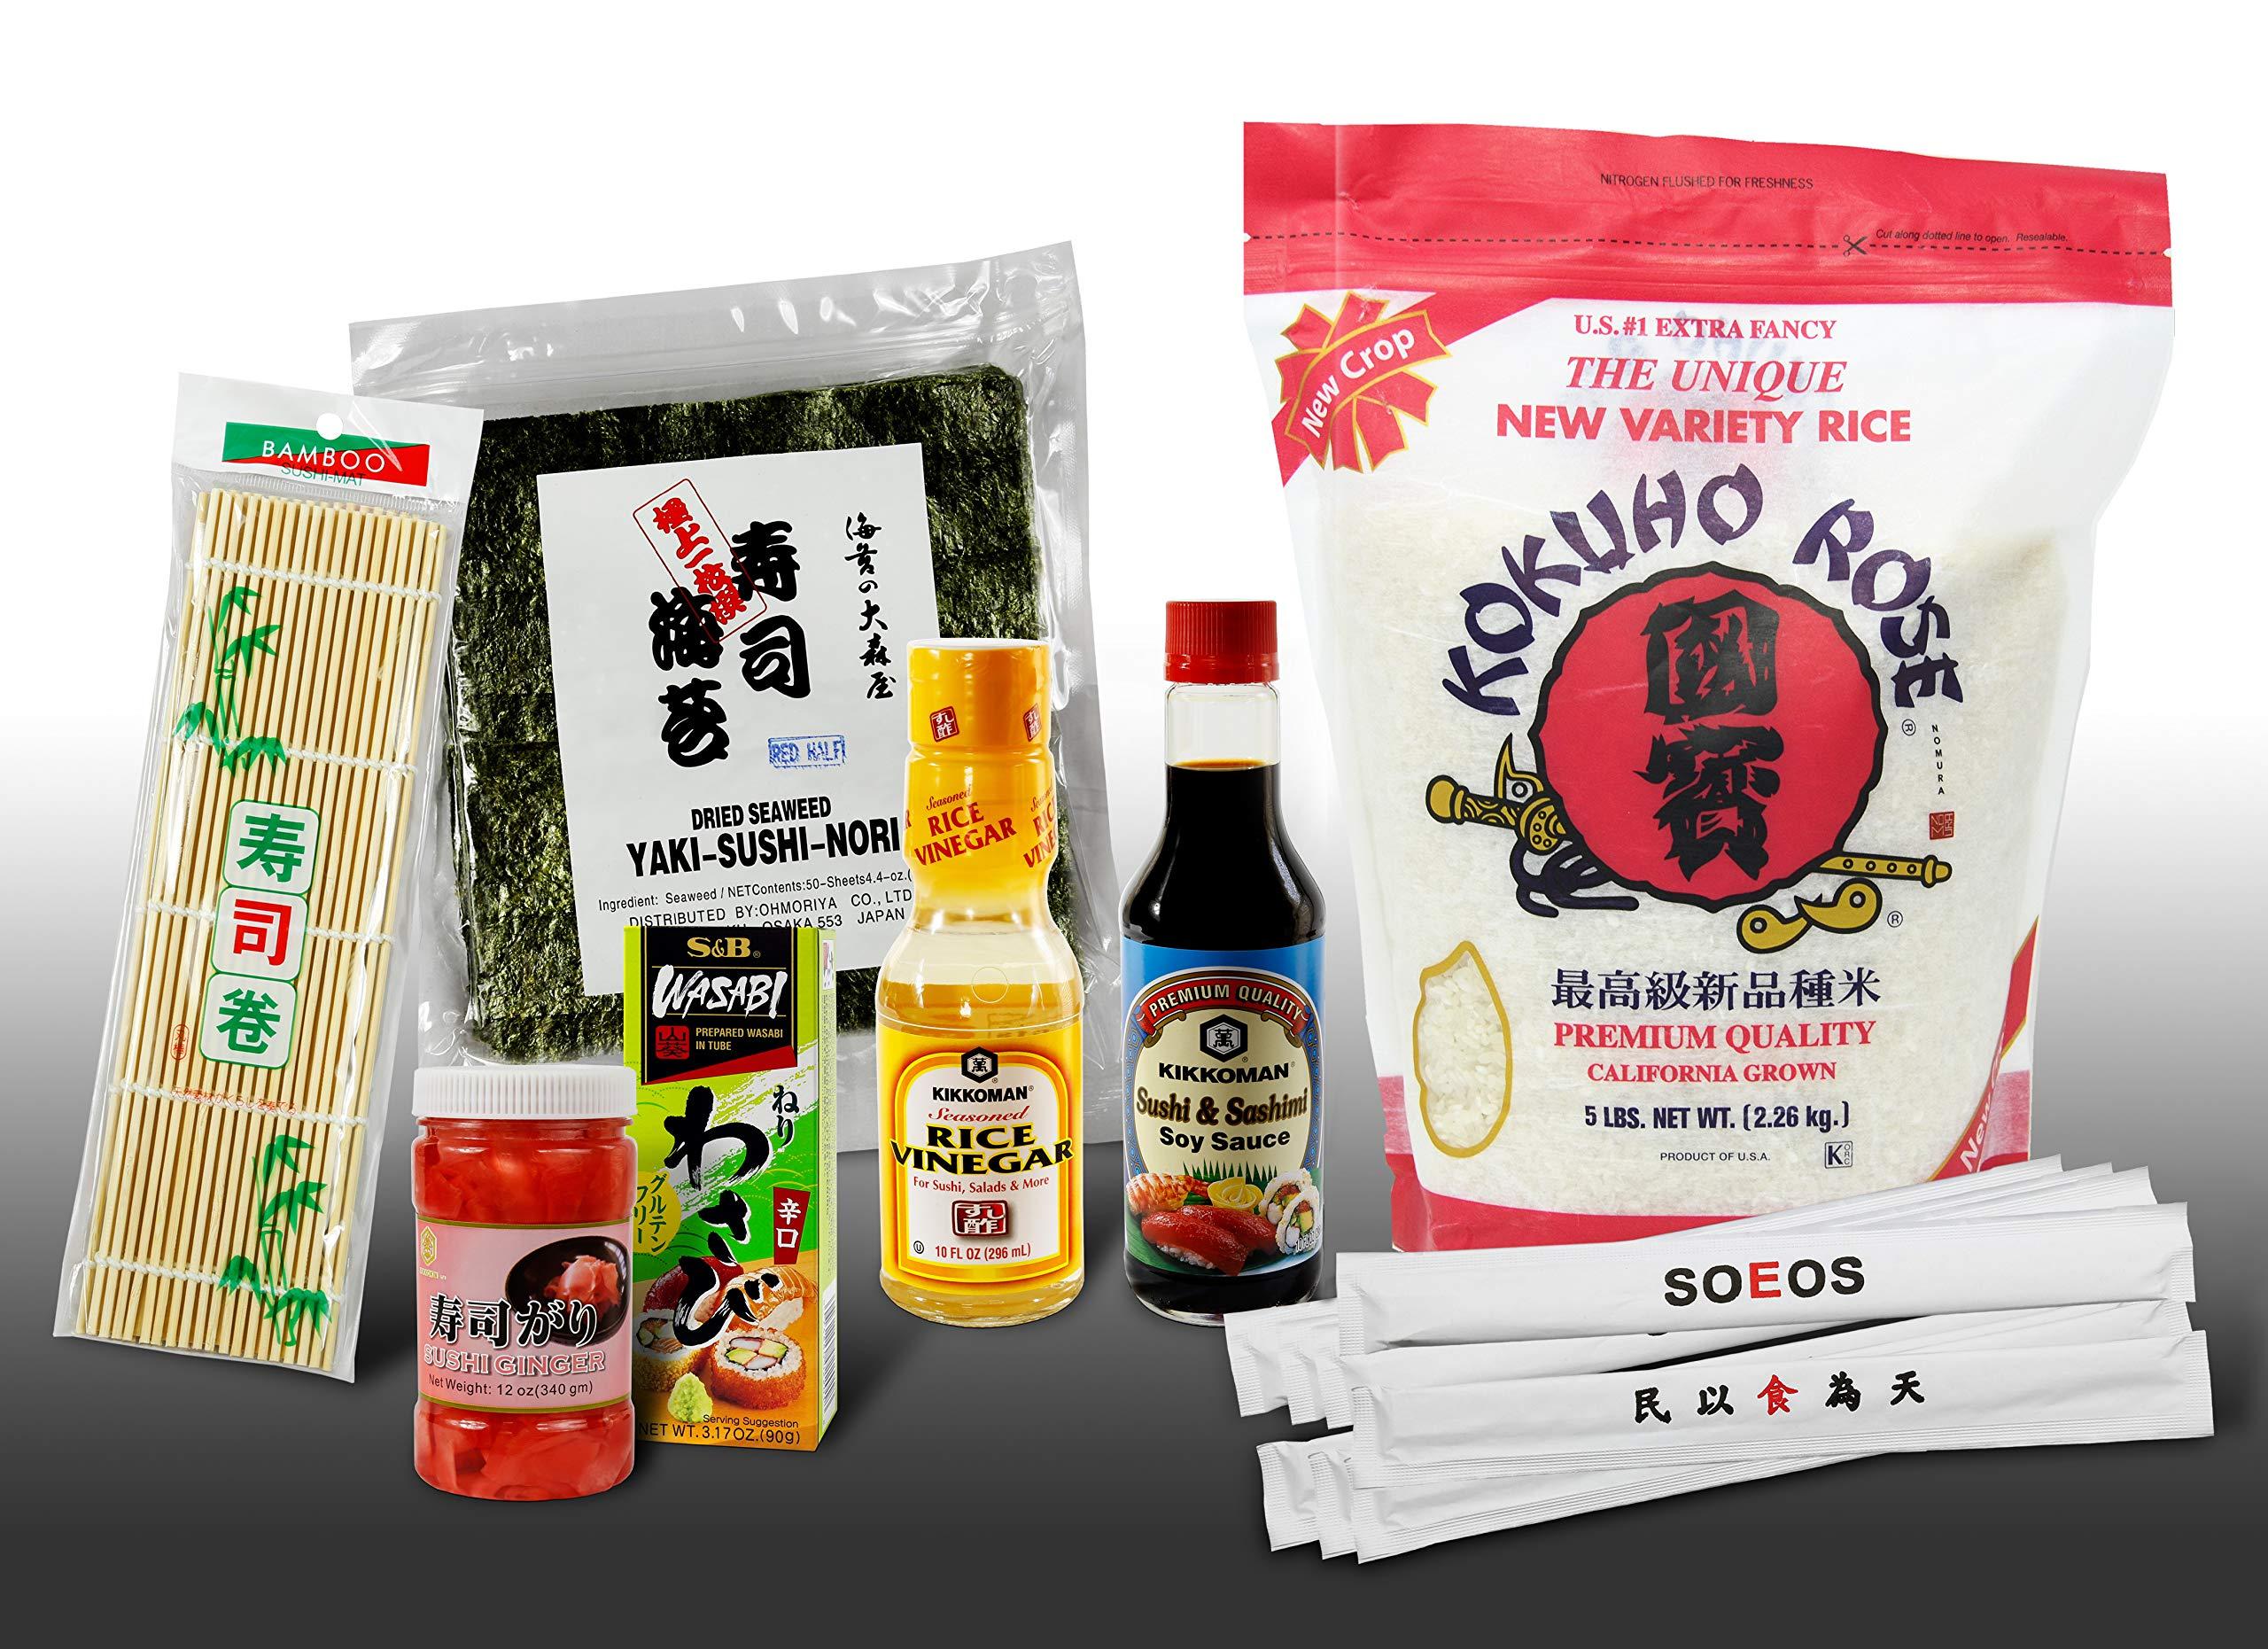 Soeos Complete Sushi Gift Box with Sushi Rice, Sushi Nori, Sushi Maker Mat, Ginger, Wasabi, Vinegar, Soy Sauce, Chopsticks